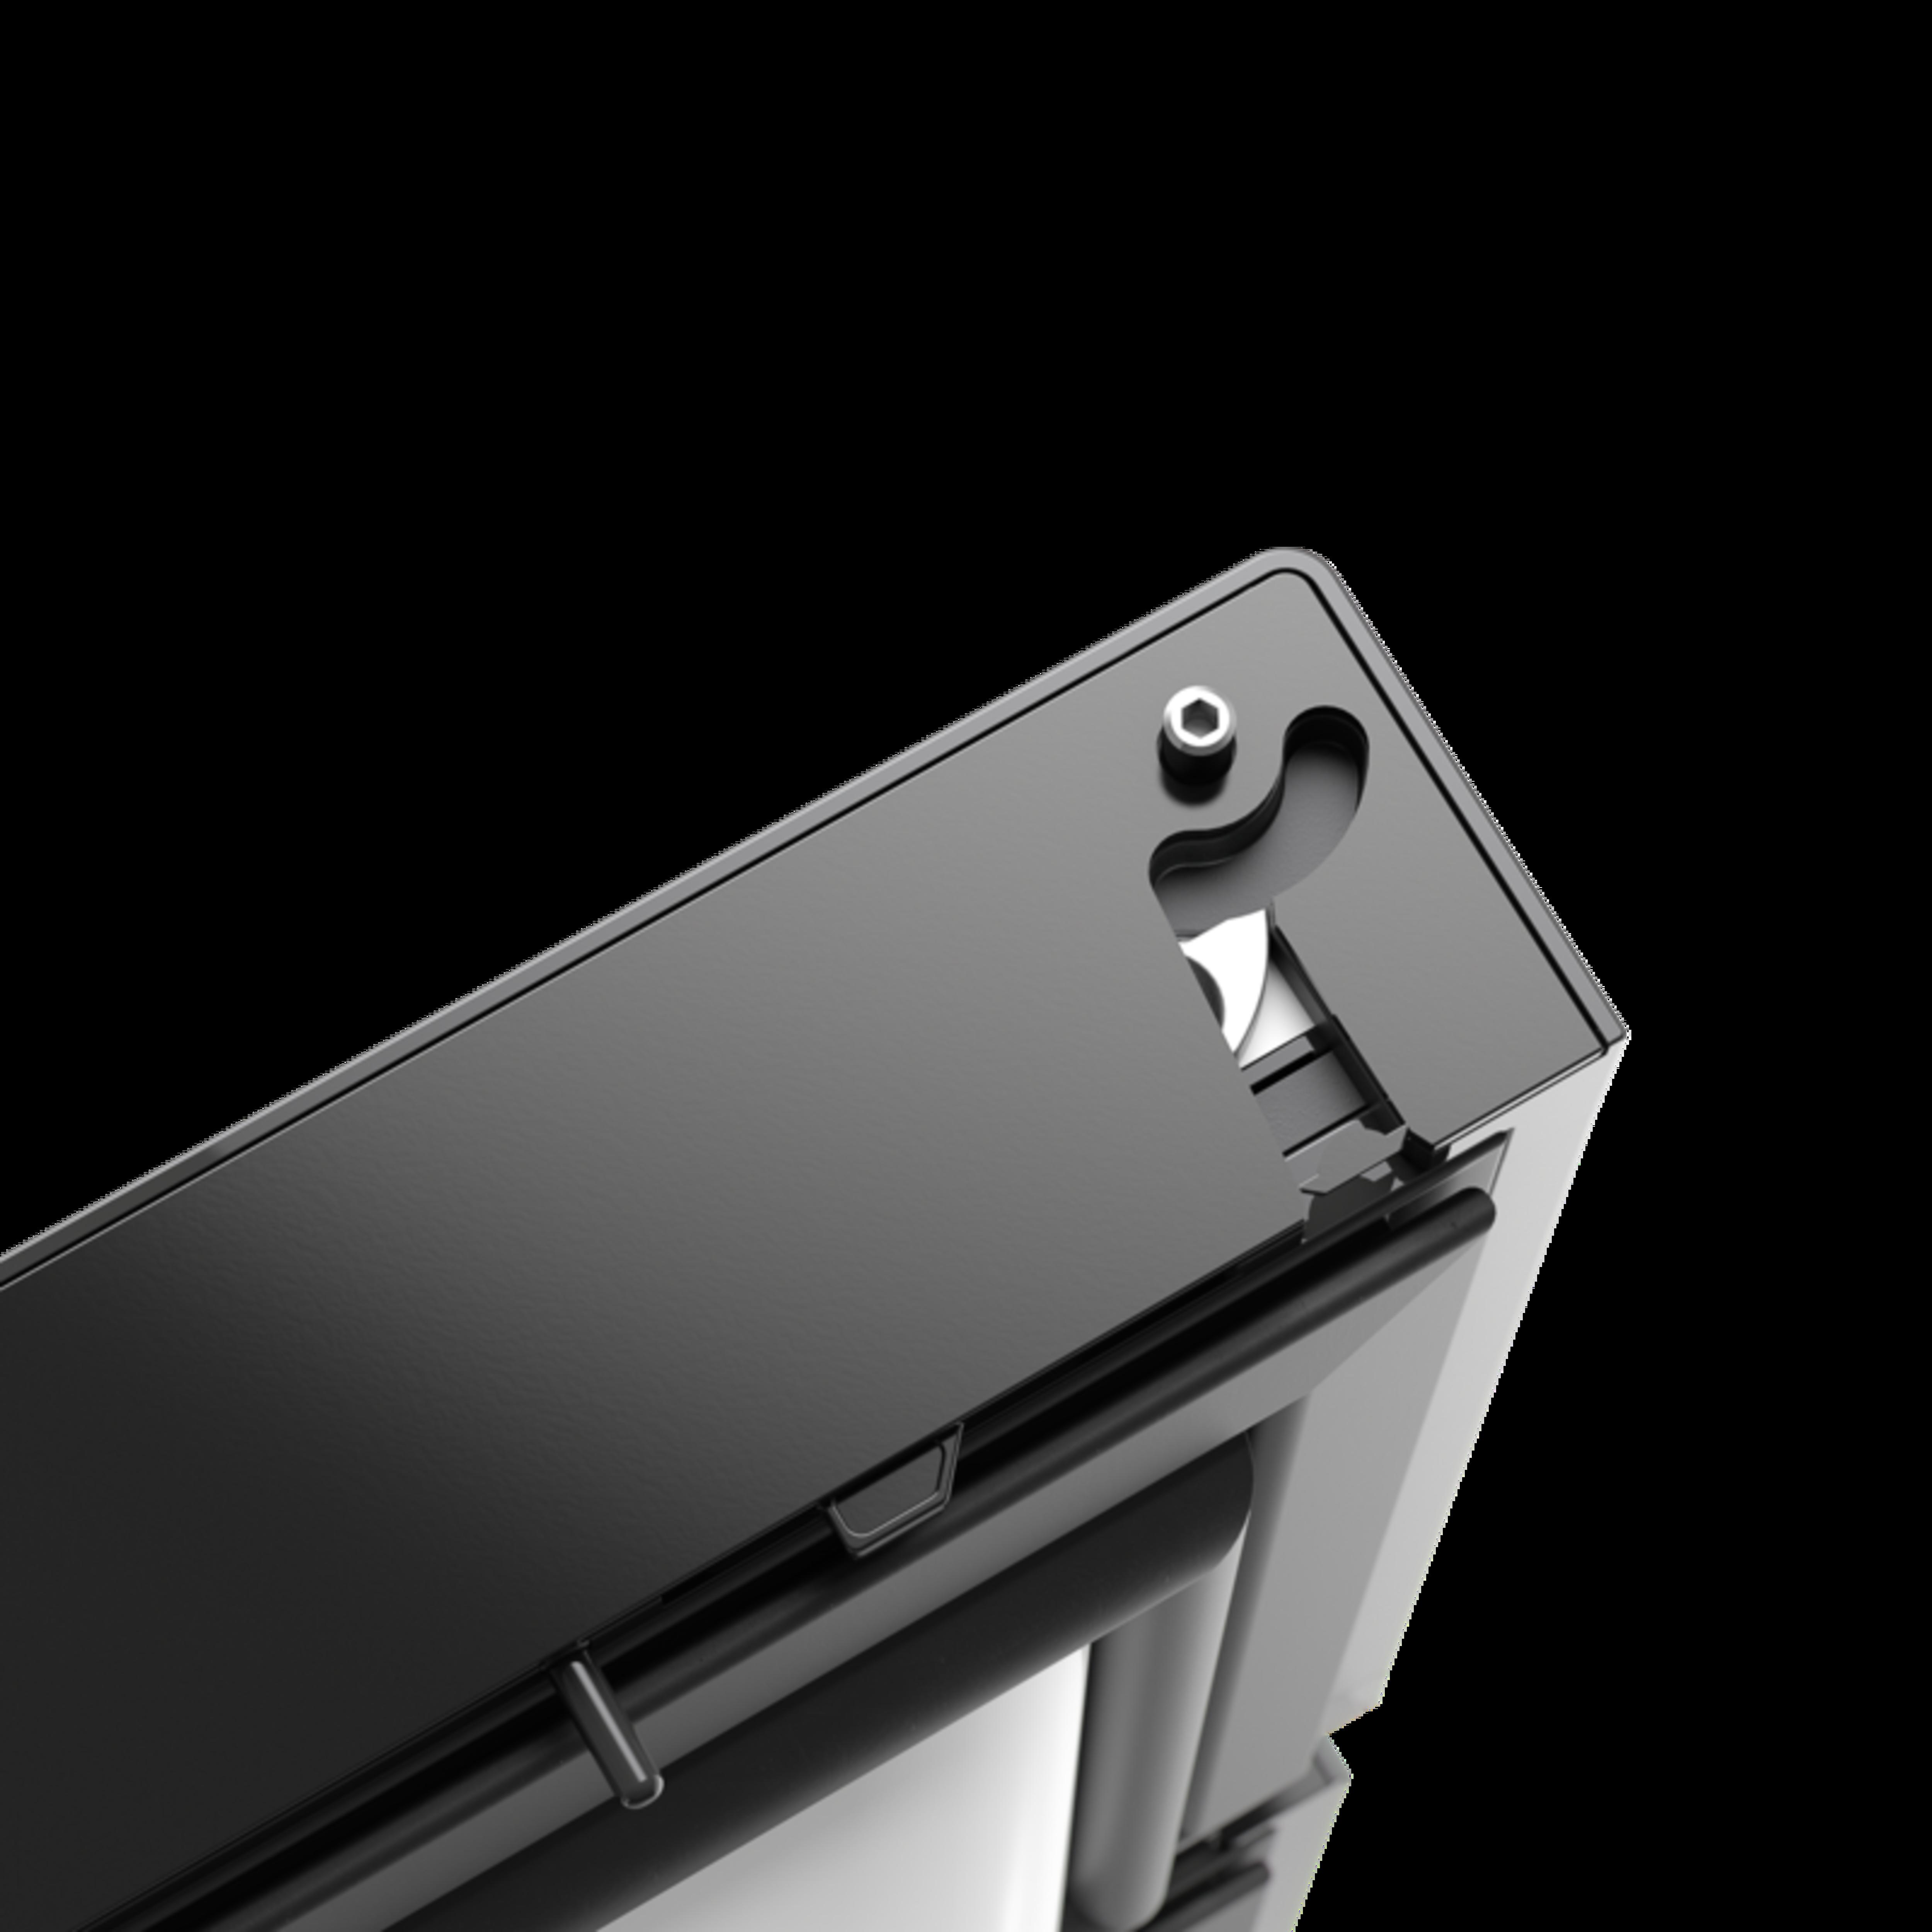 Topunkts låsesystem